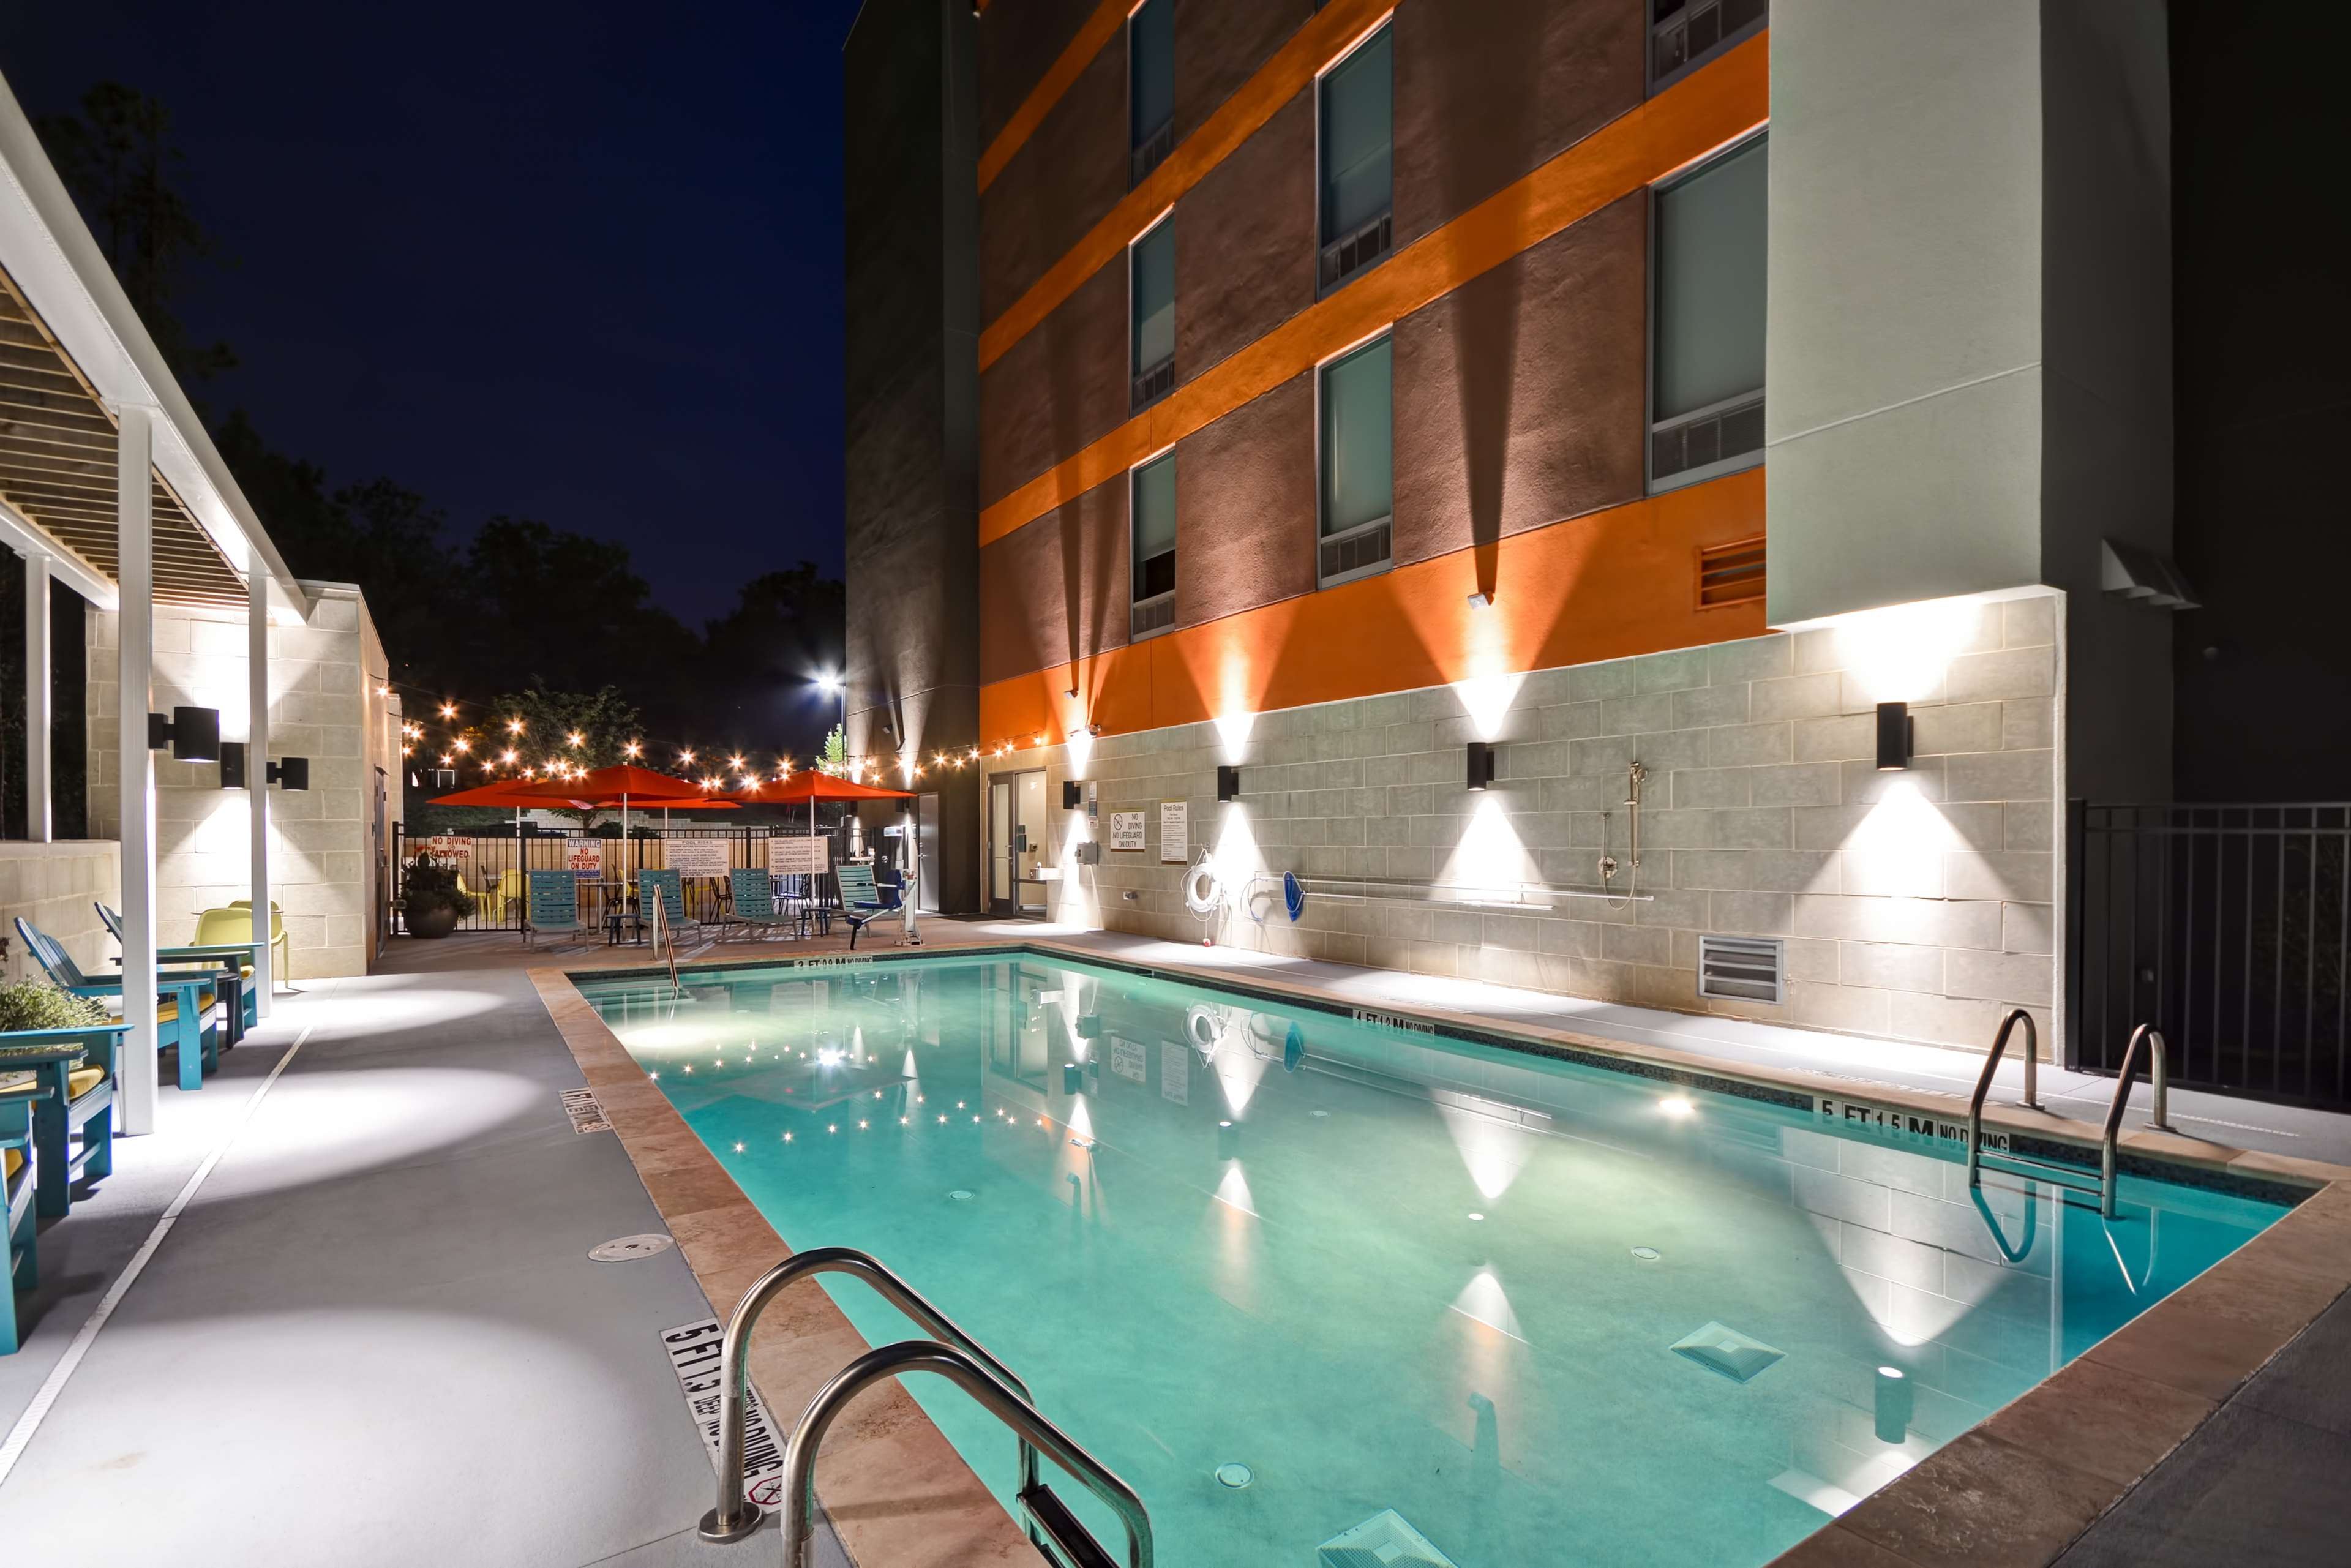 Home2 Suites by Hilton Atlanta West Lithia Springs image 12